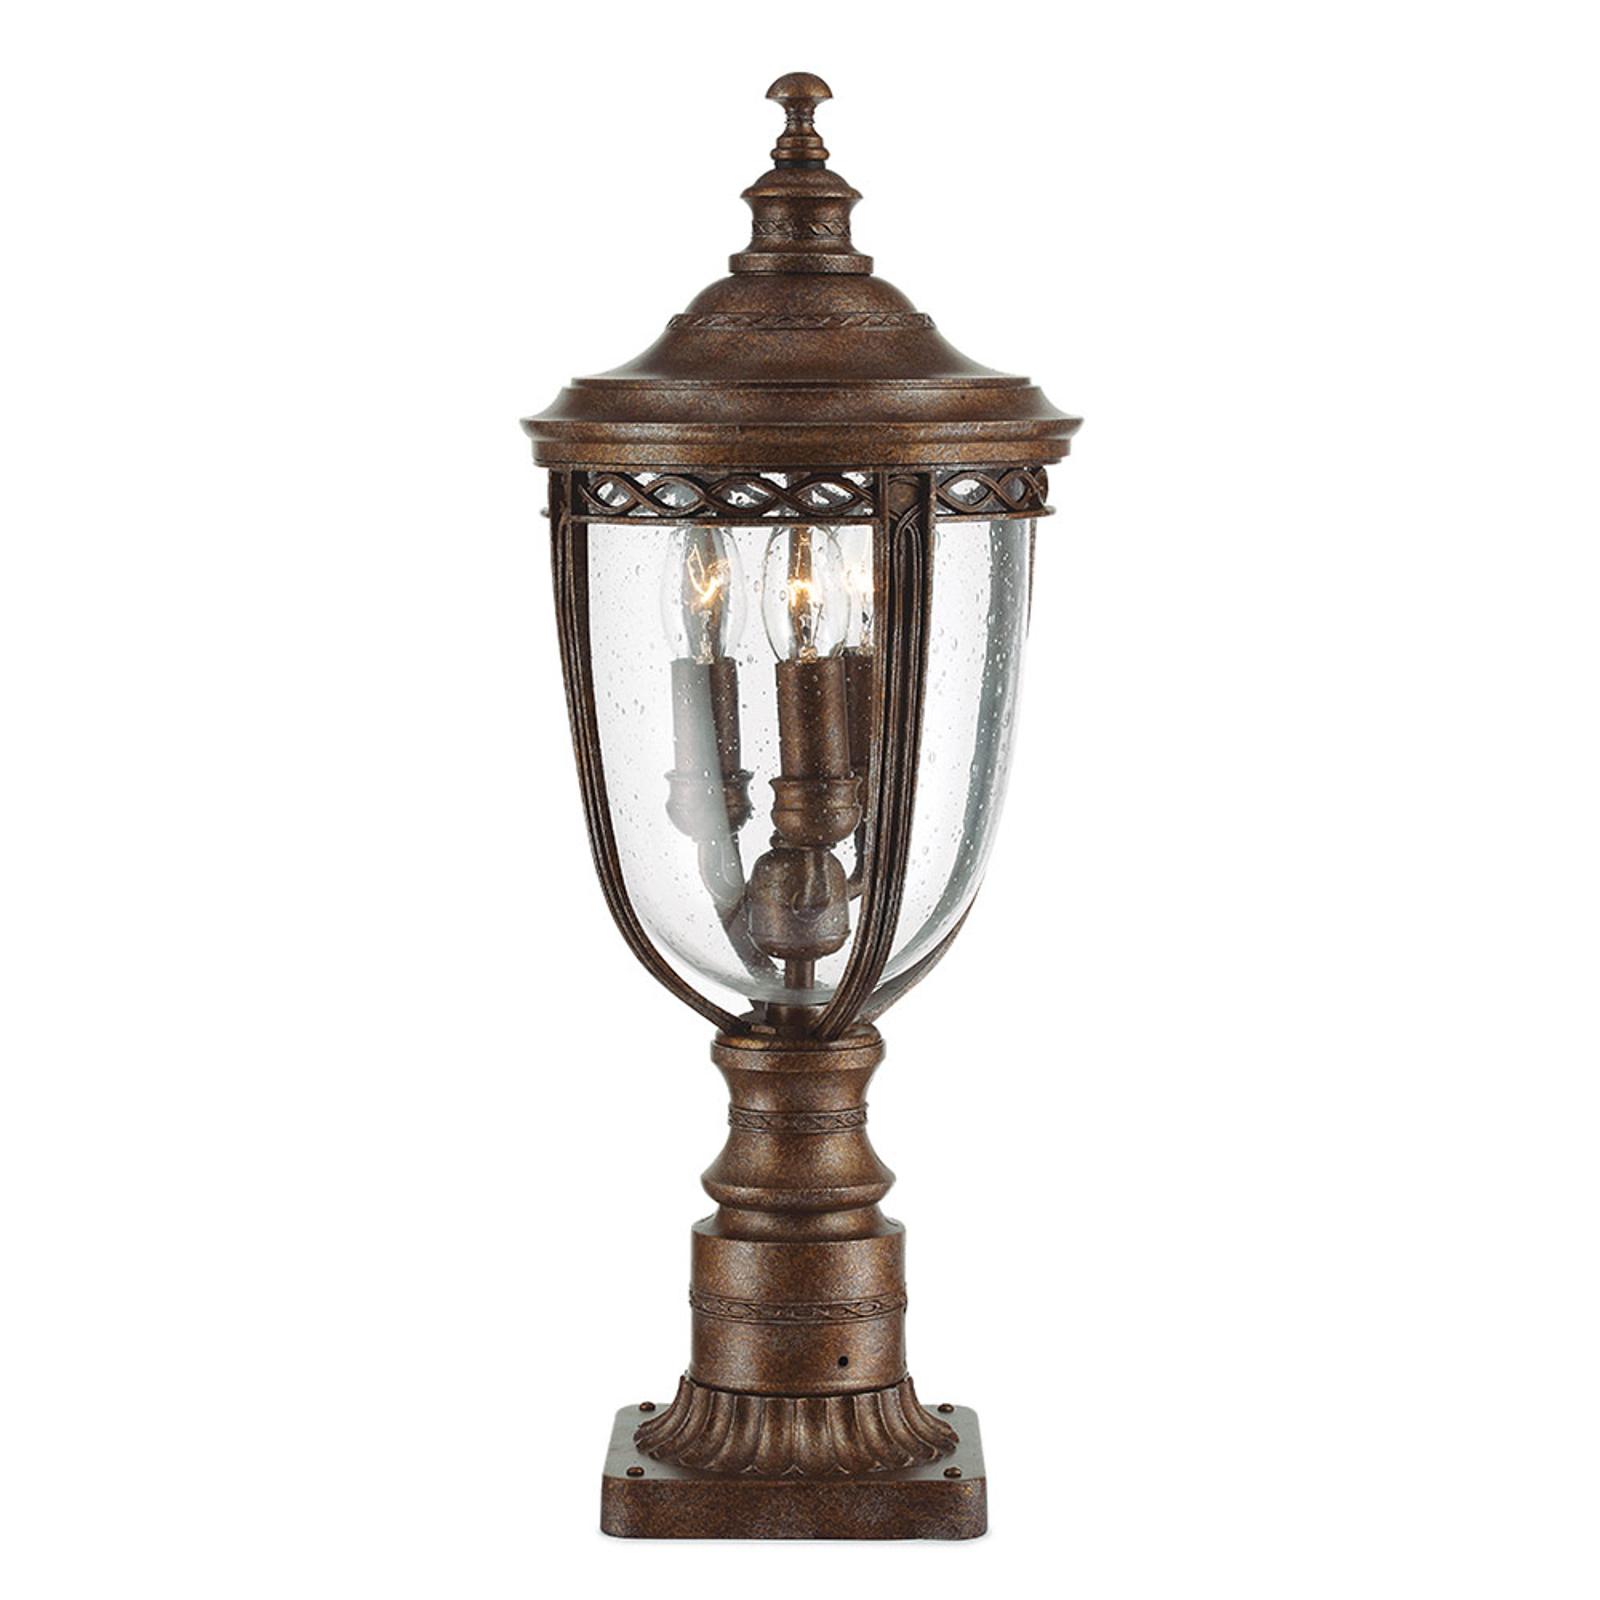 Sockelleuchte English Bridle, bronze